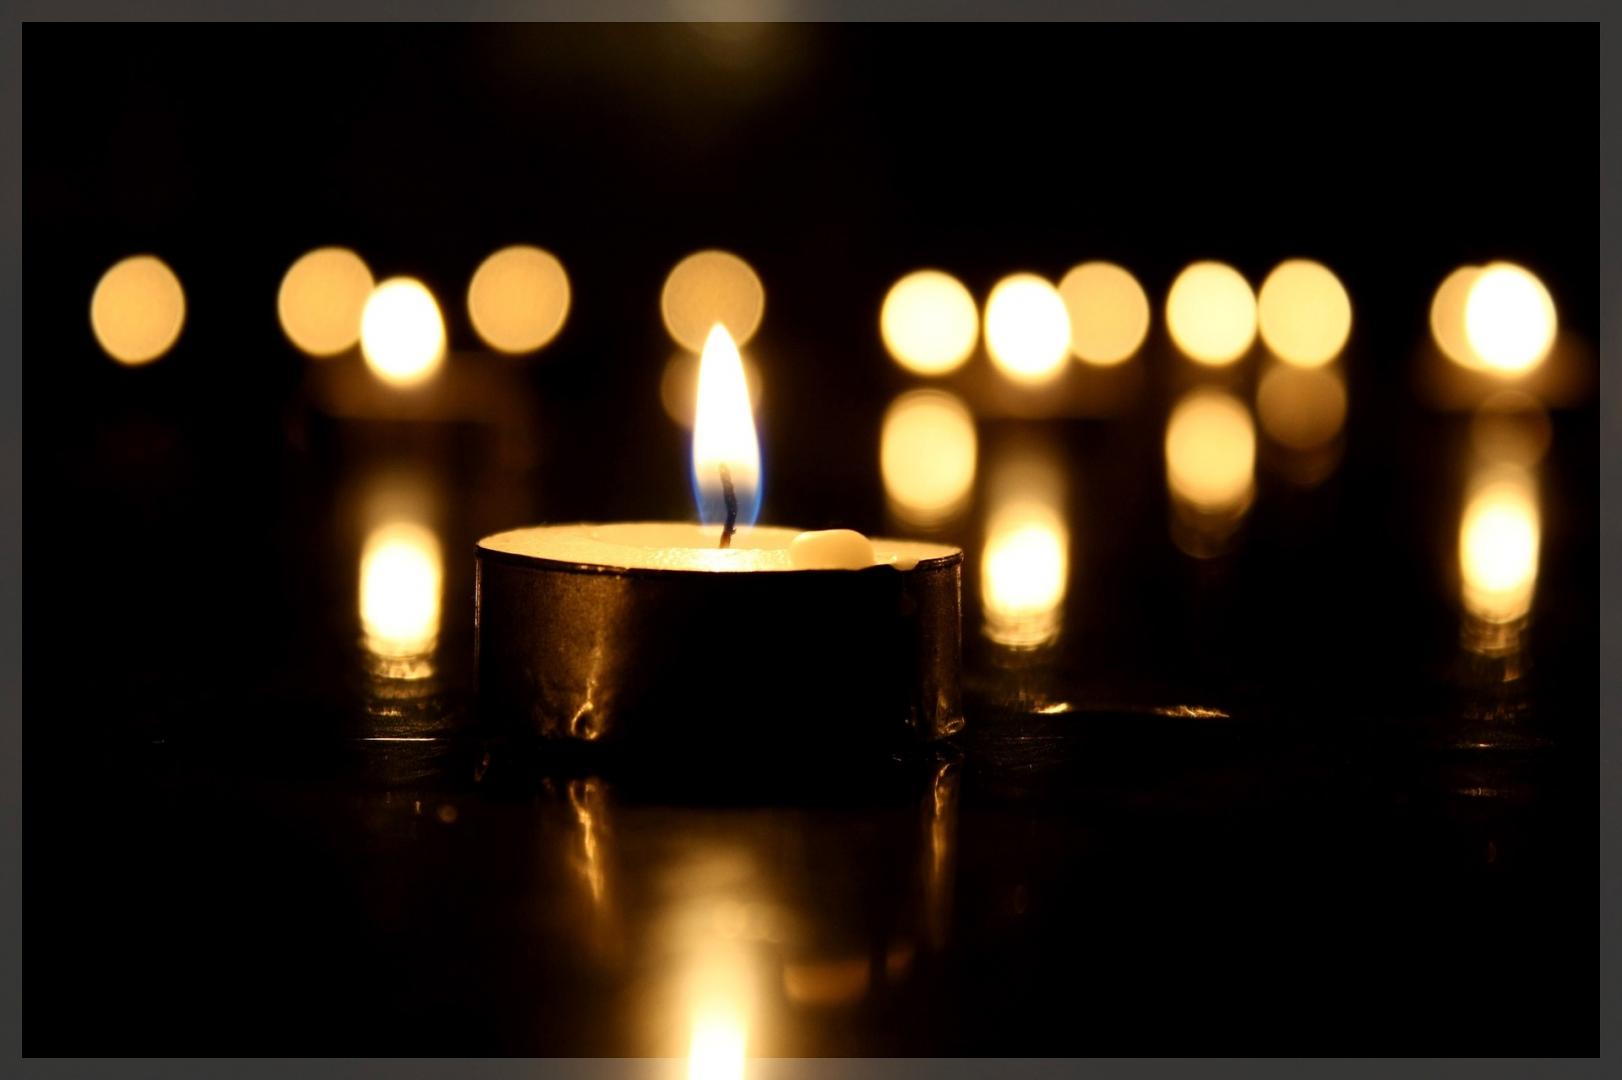 Днем рожденея, траурную картинку свечи